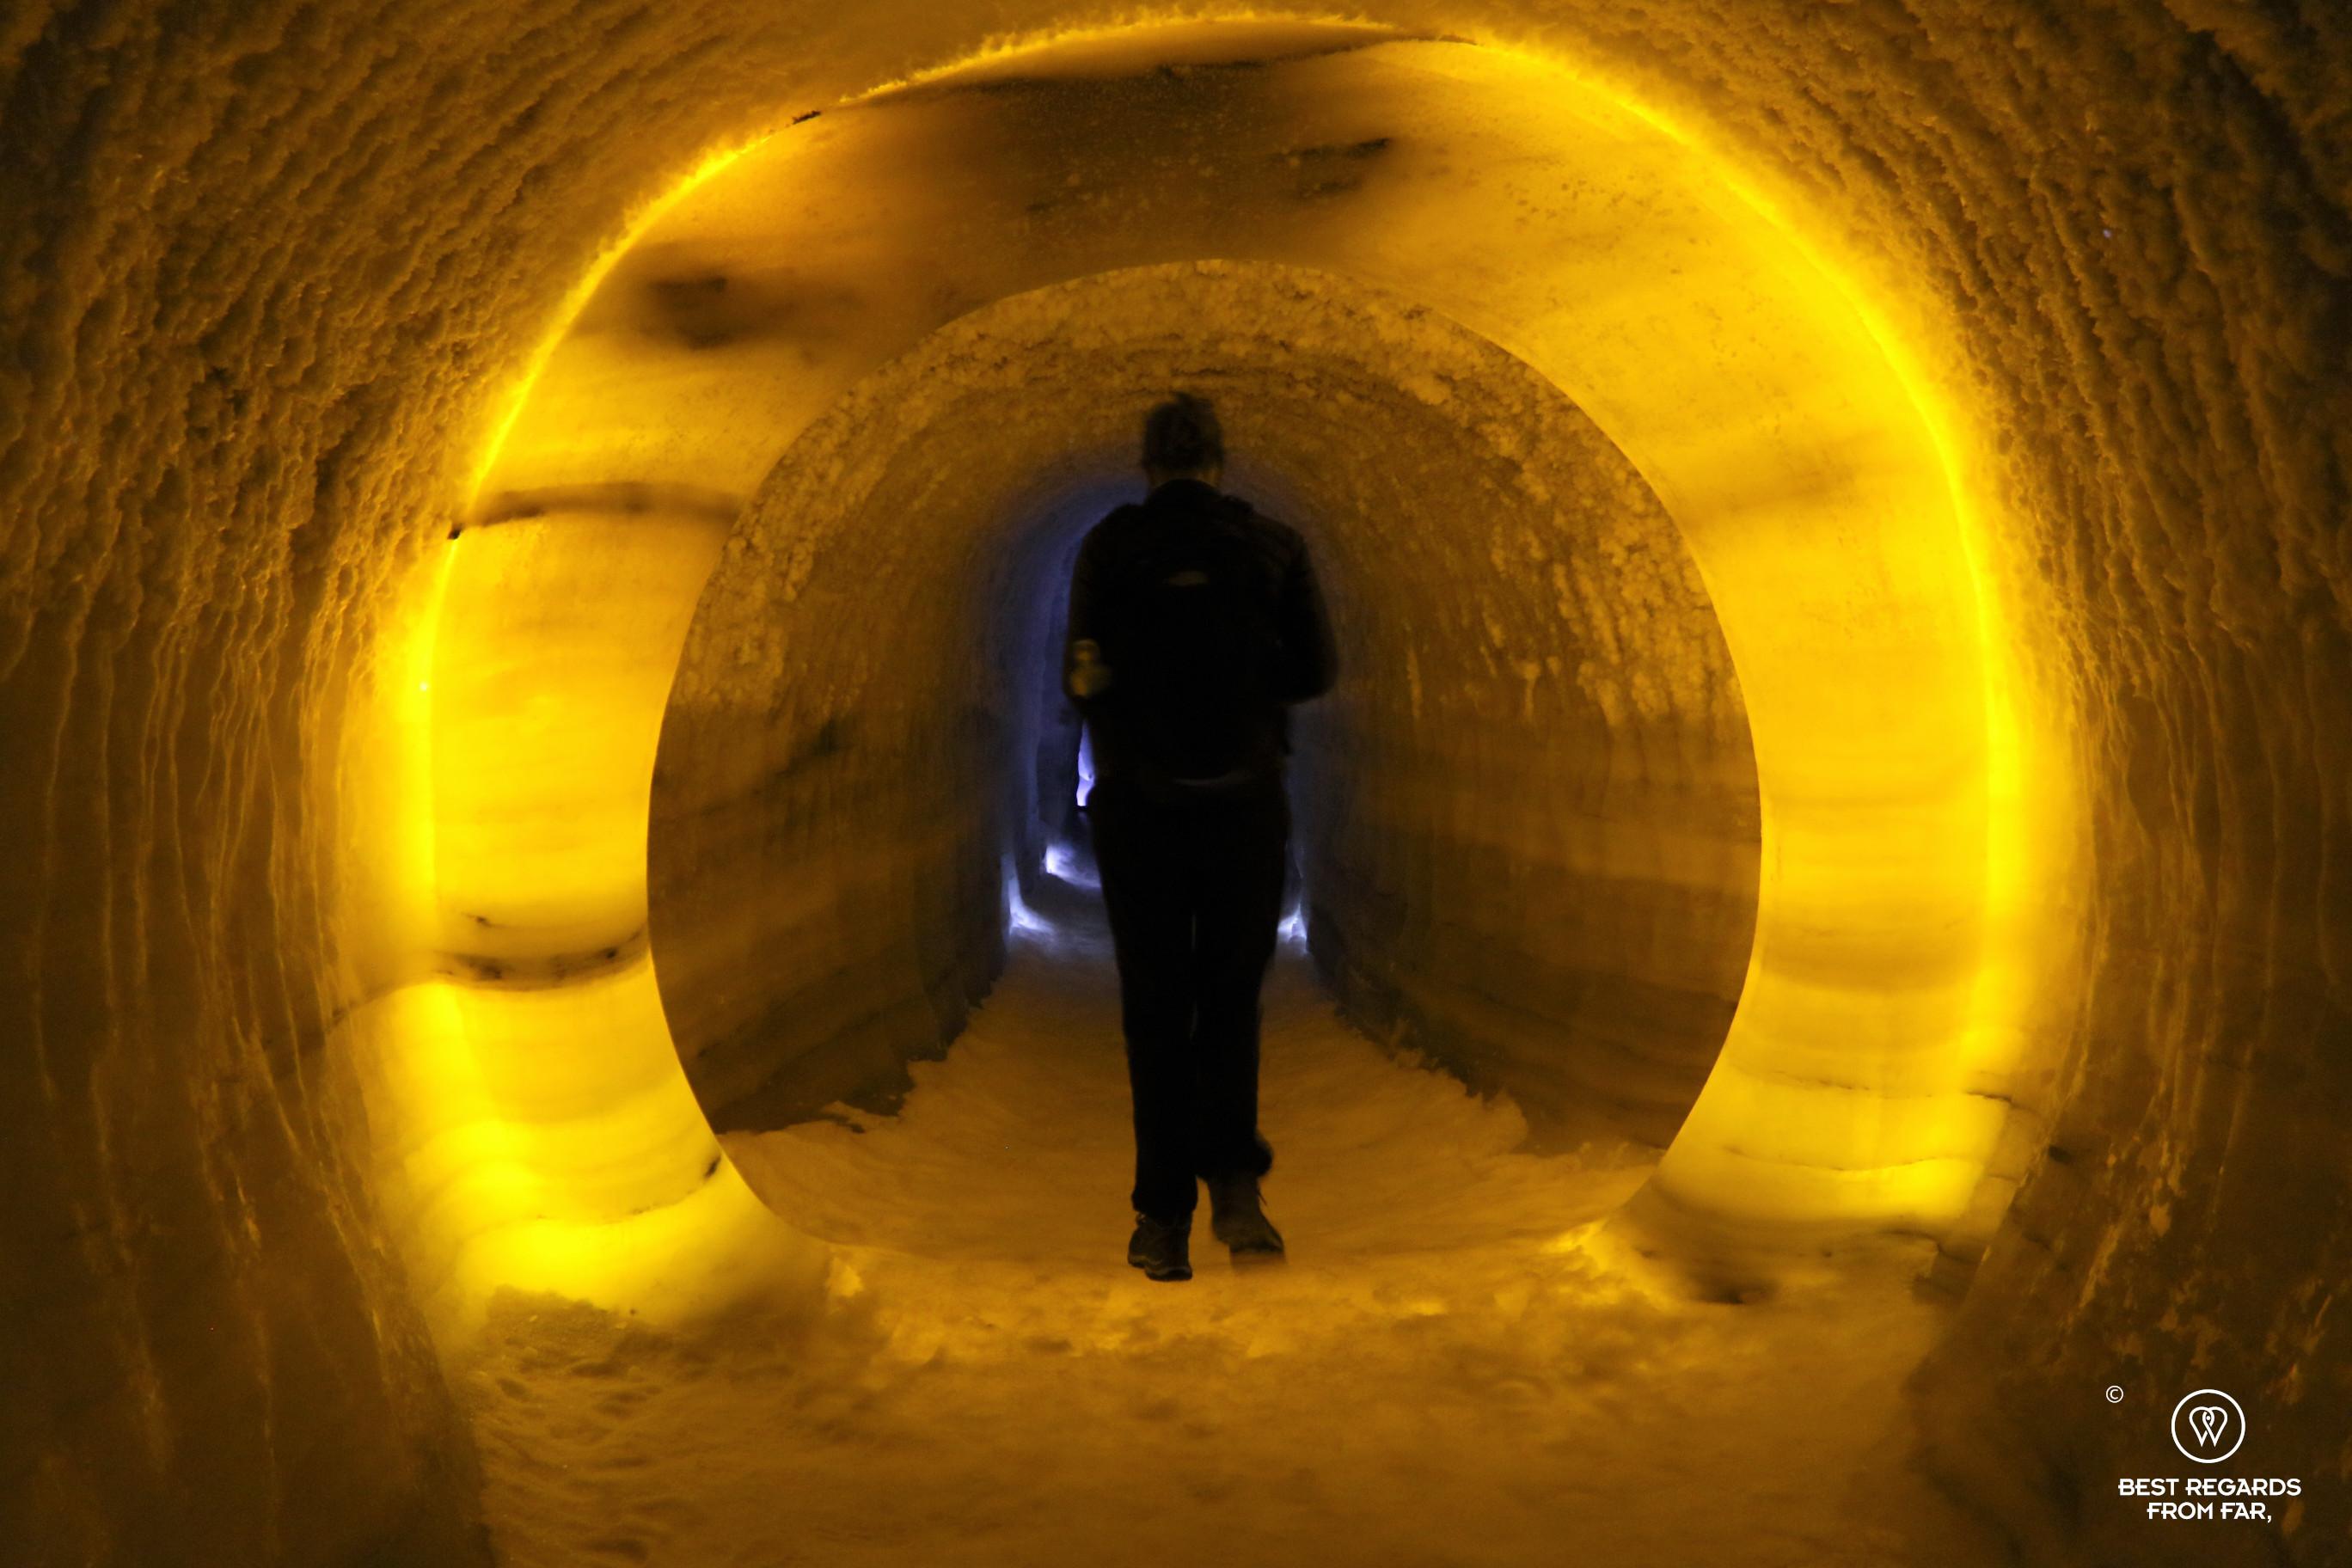 Inside the ice tunnel, Jotunheim, Norway